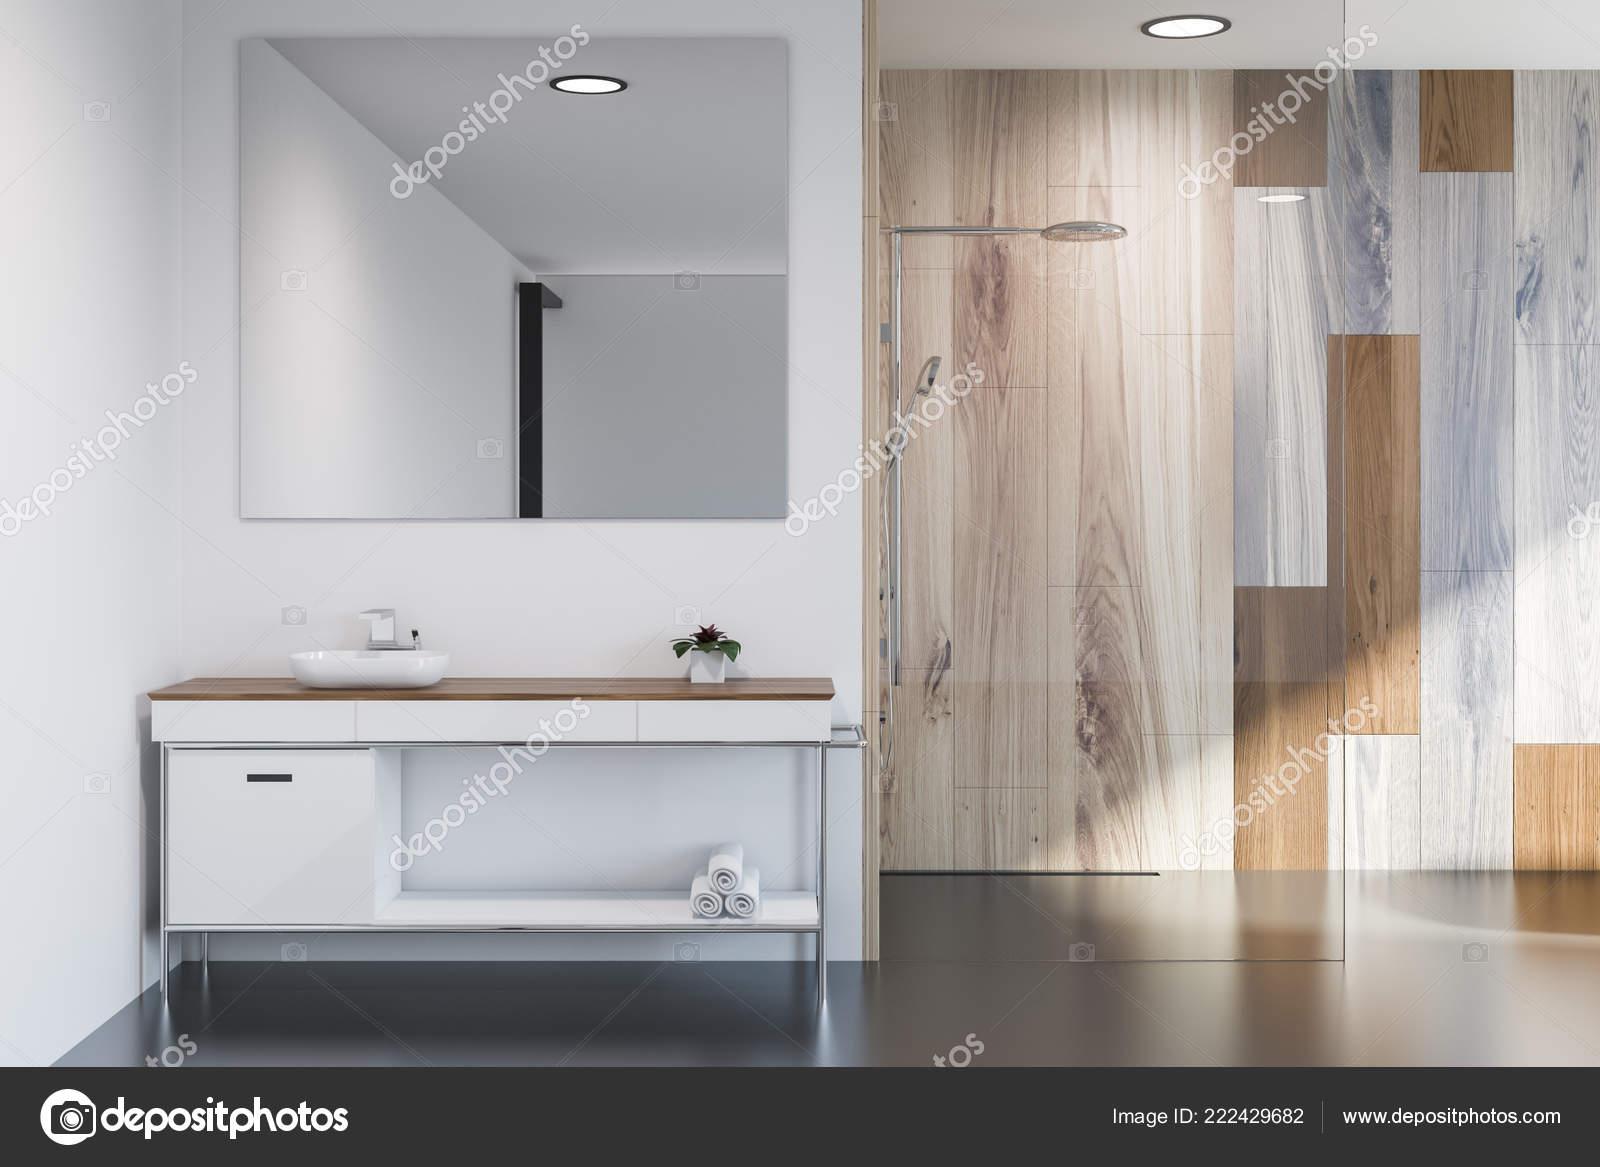 . Modern Bathroom Interior Gray Wooden Walls Sink Big Square Mirror